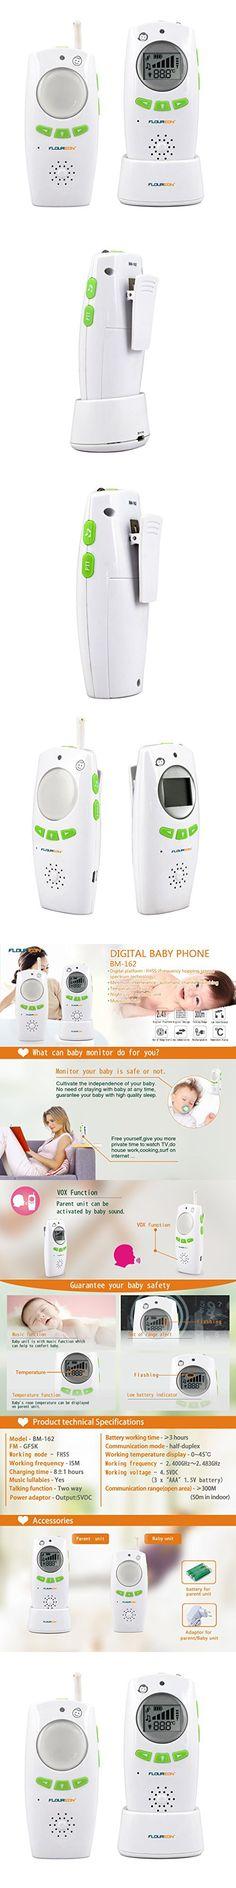 Floureon BM162 Safe & Sound Digital Audio Baby Monitor With One Parent Unit , Green